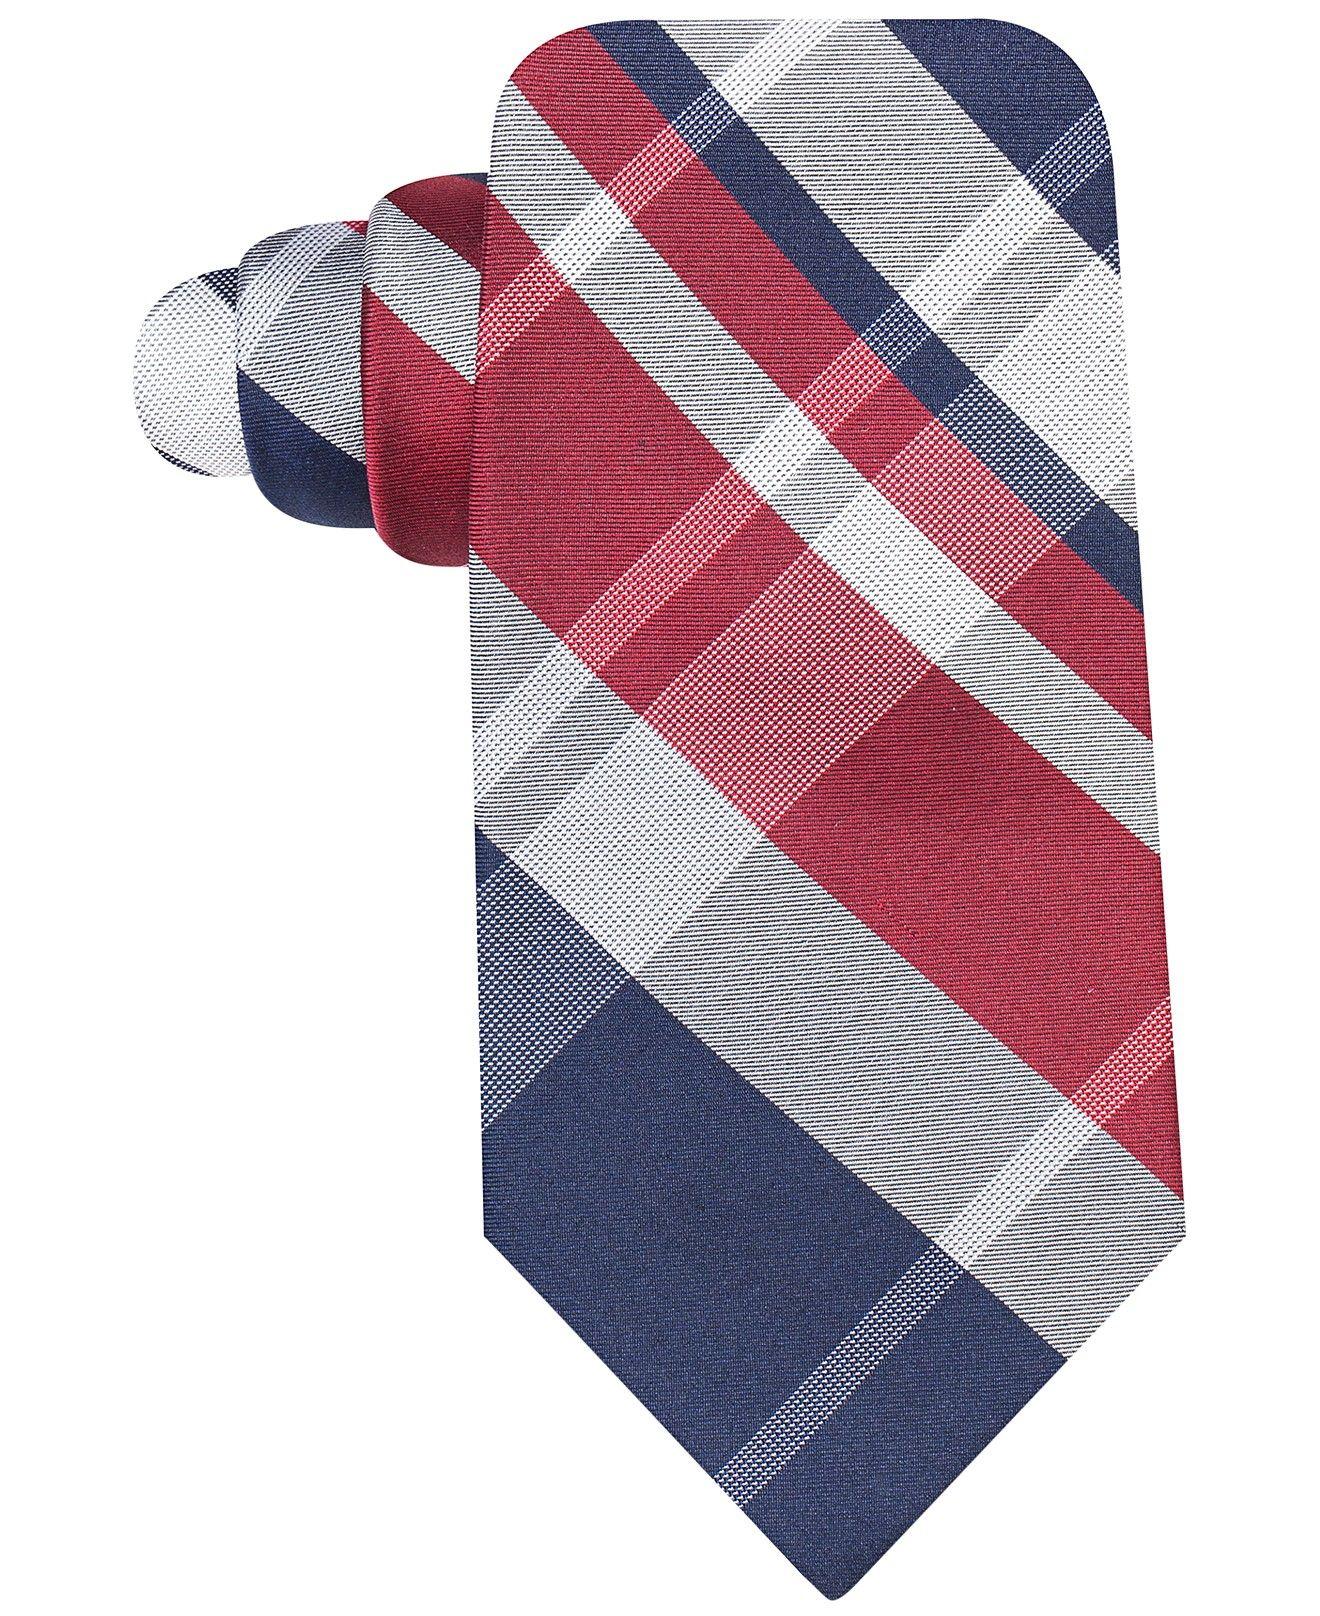 Ryan Seacrest Distinction Backlot Plaid Slim Tie - Ties & Pocket Squares - Men - Macy's